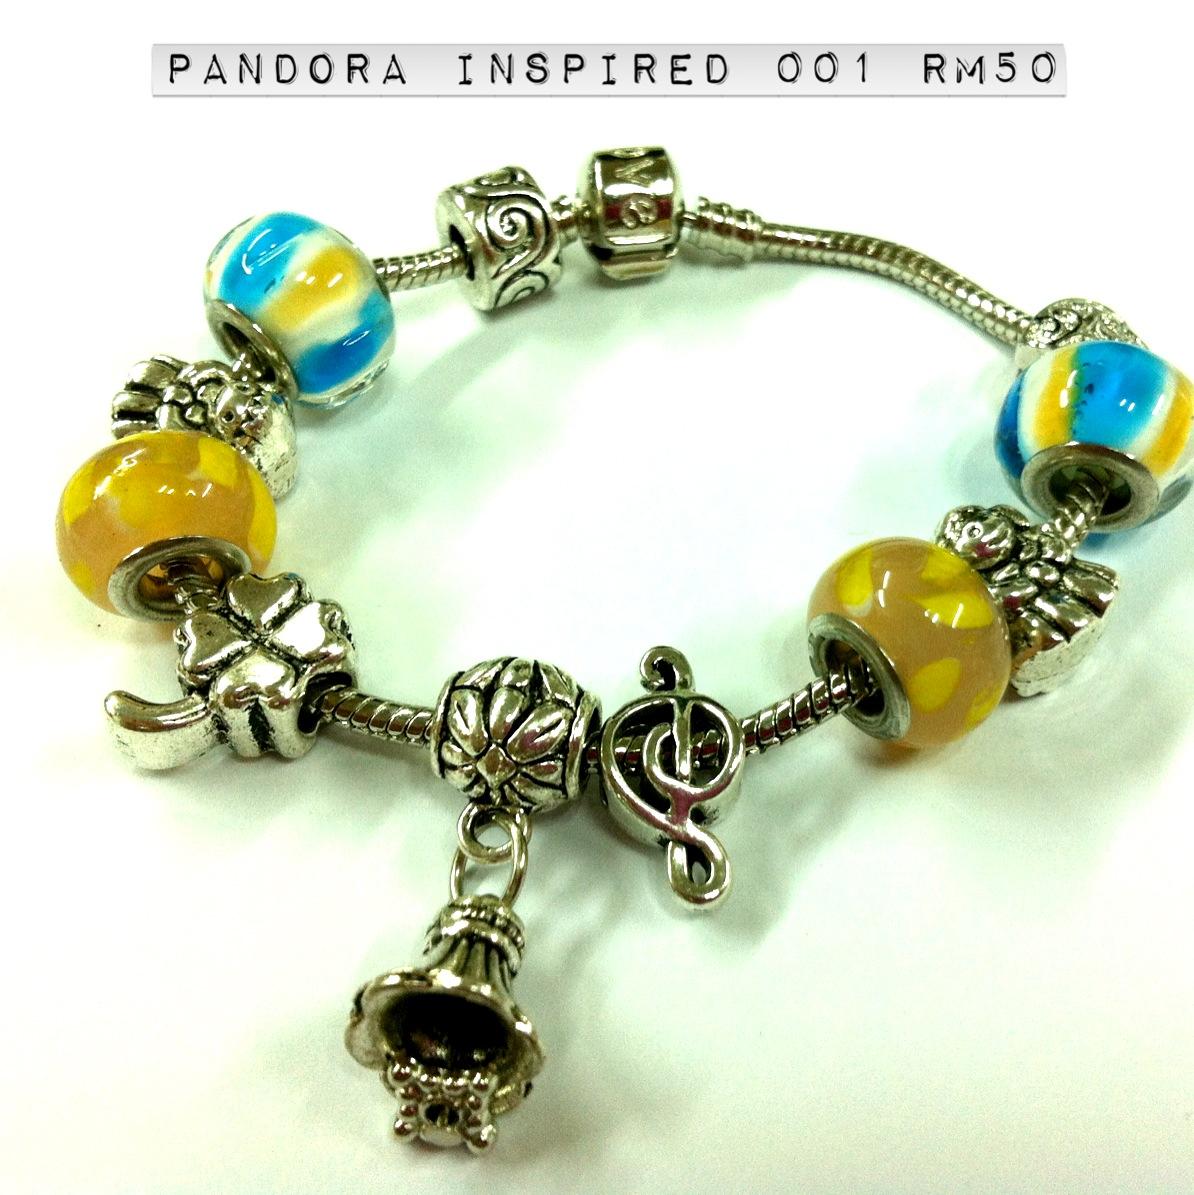 doll house pandora inspired charm bracelets